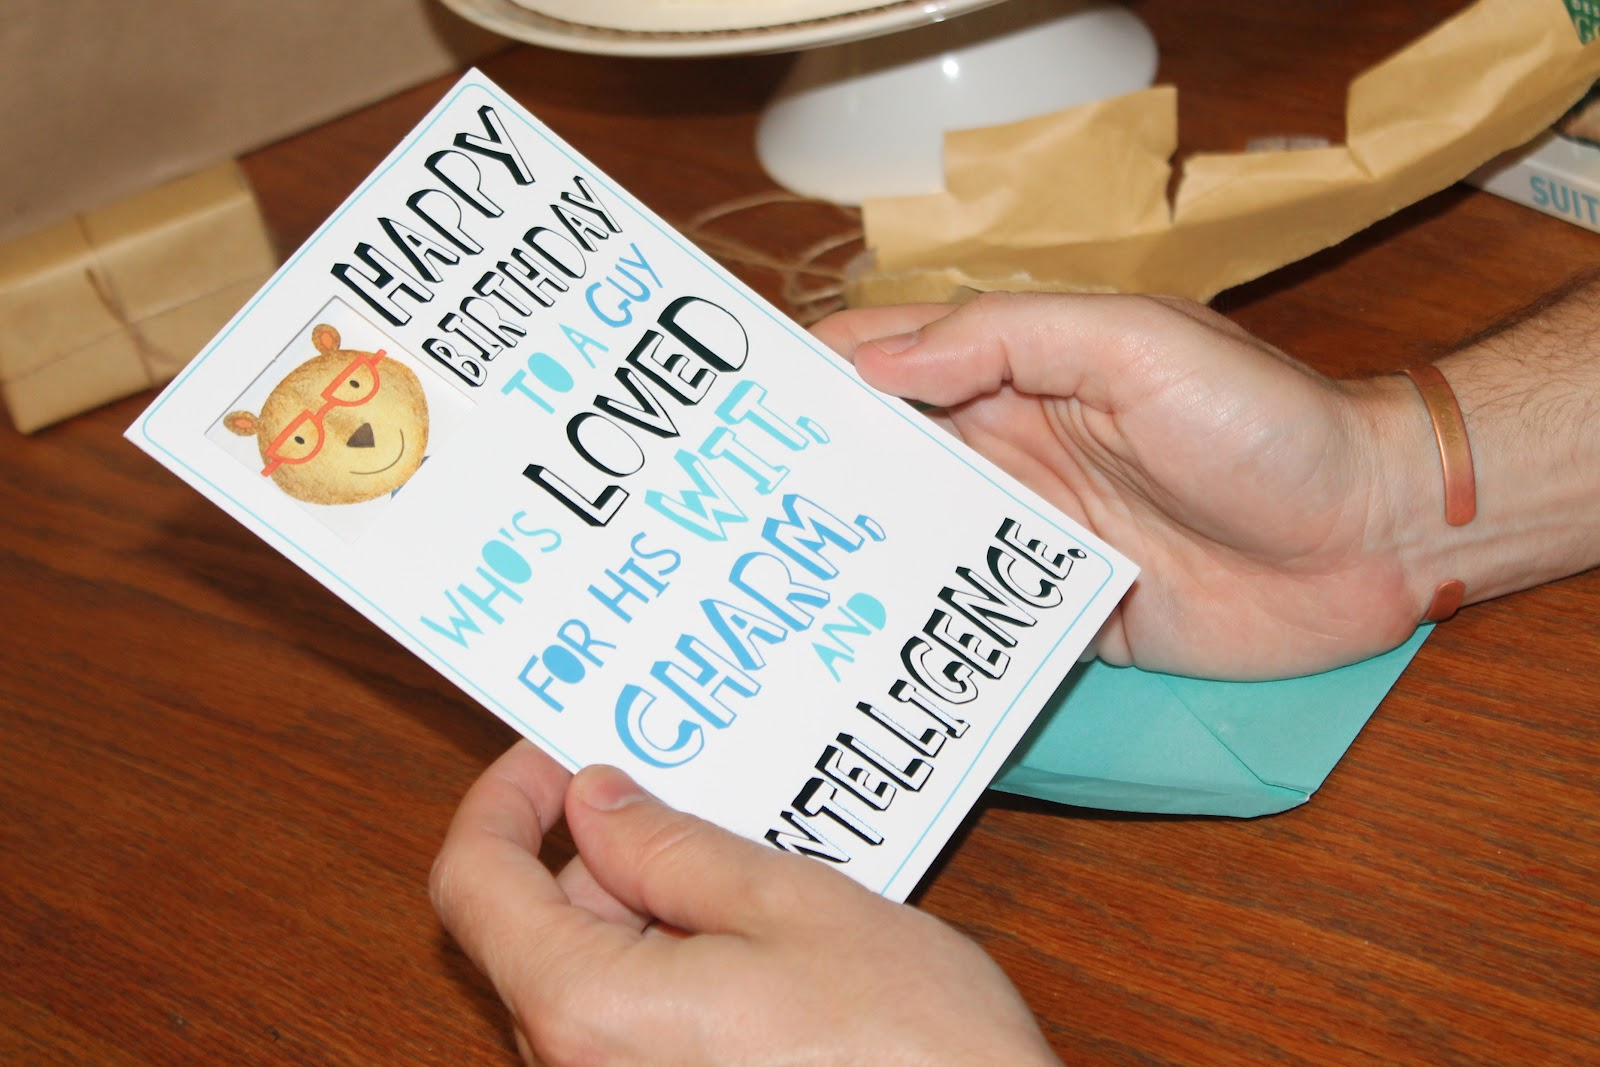 Carolina Charm Matts 32nd Birthday – Target Birthday Cards